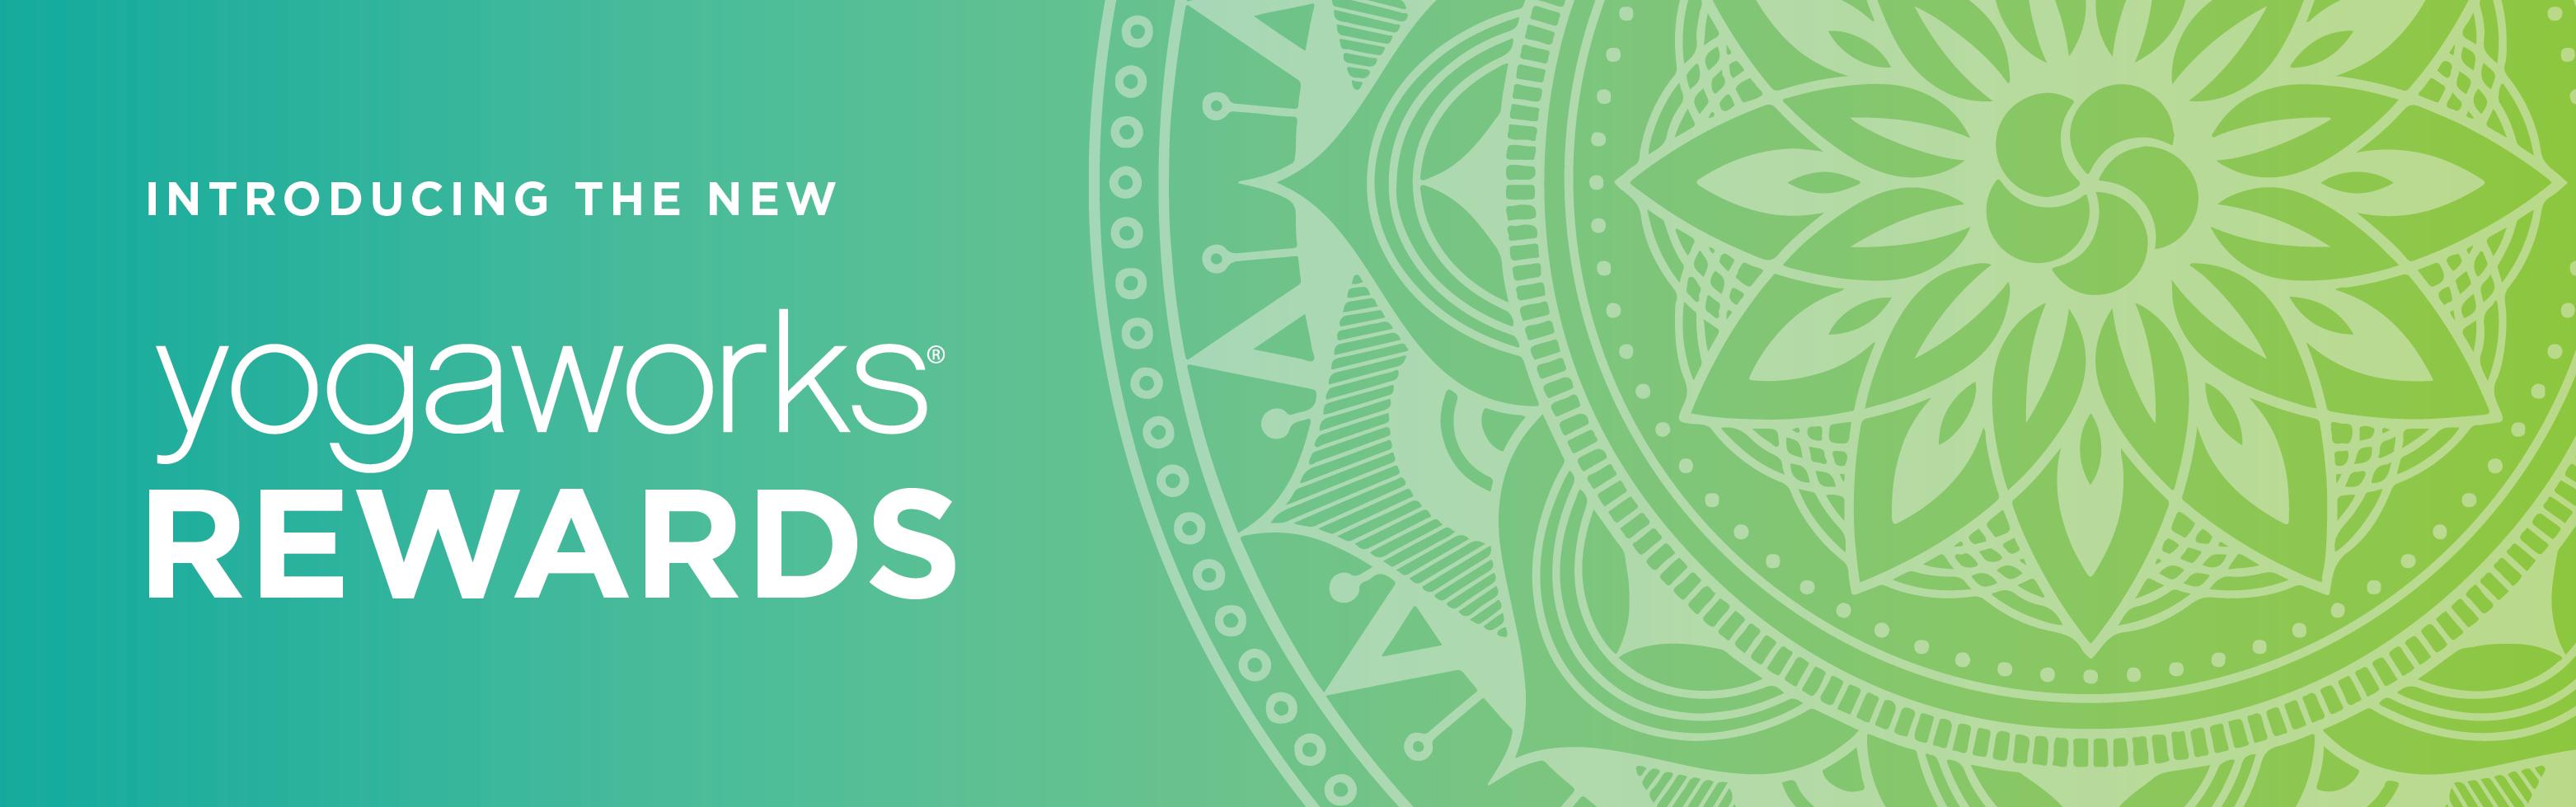 Introducing The New YogaWorks Rewards